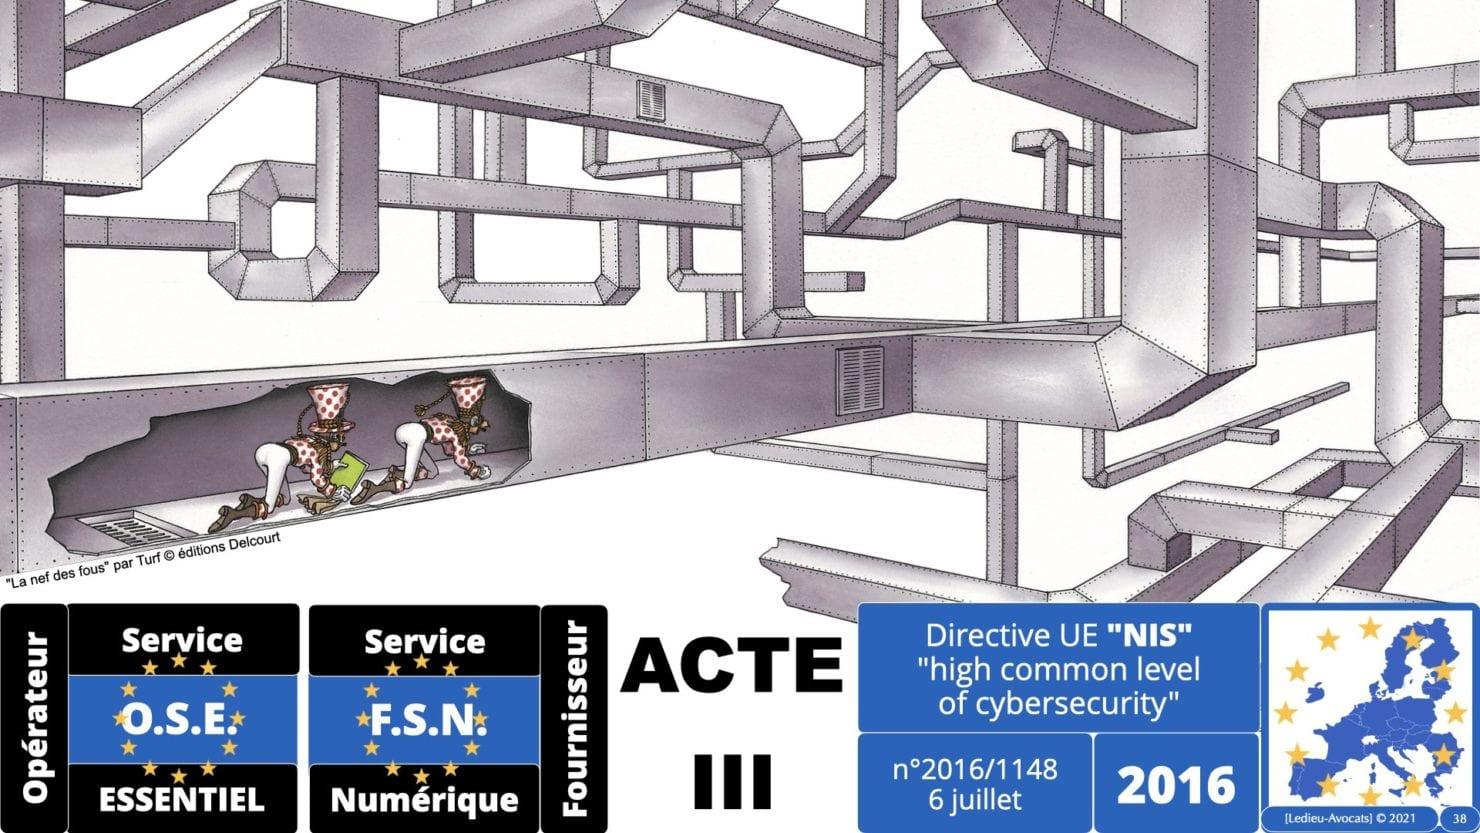 337 cyber sécurité #1 OIV OSE Critical Entities © Ledieu-avocat 15-06-2021.038